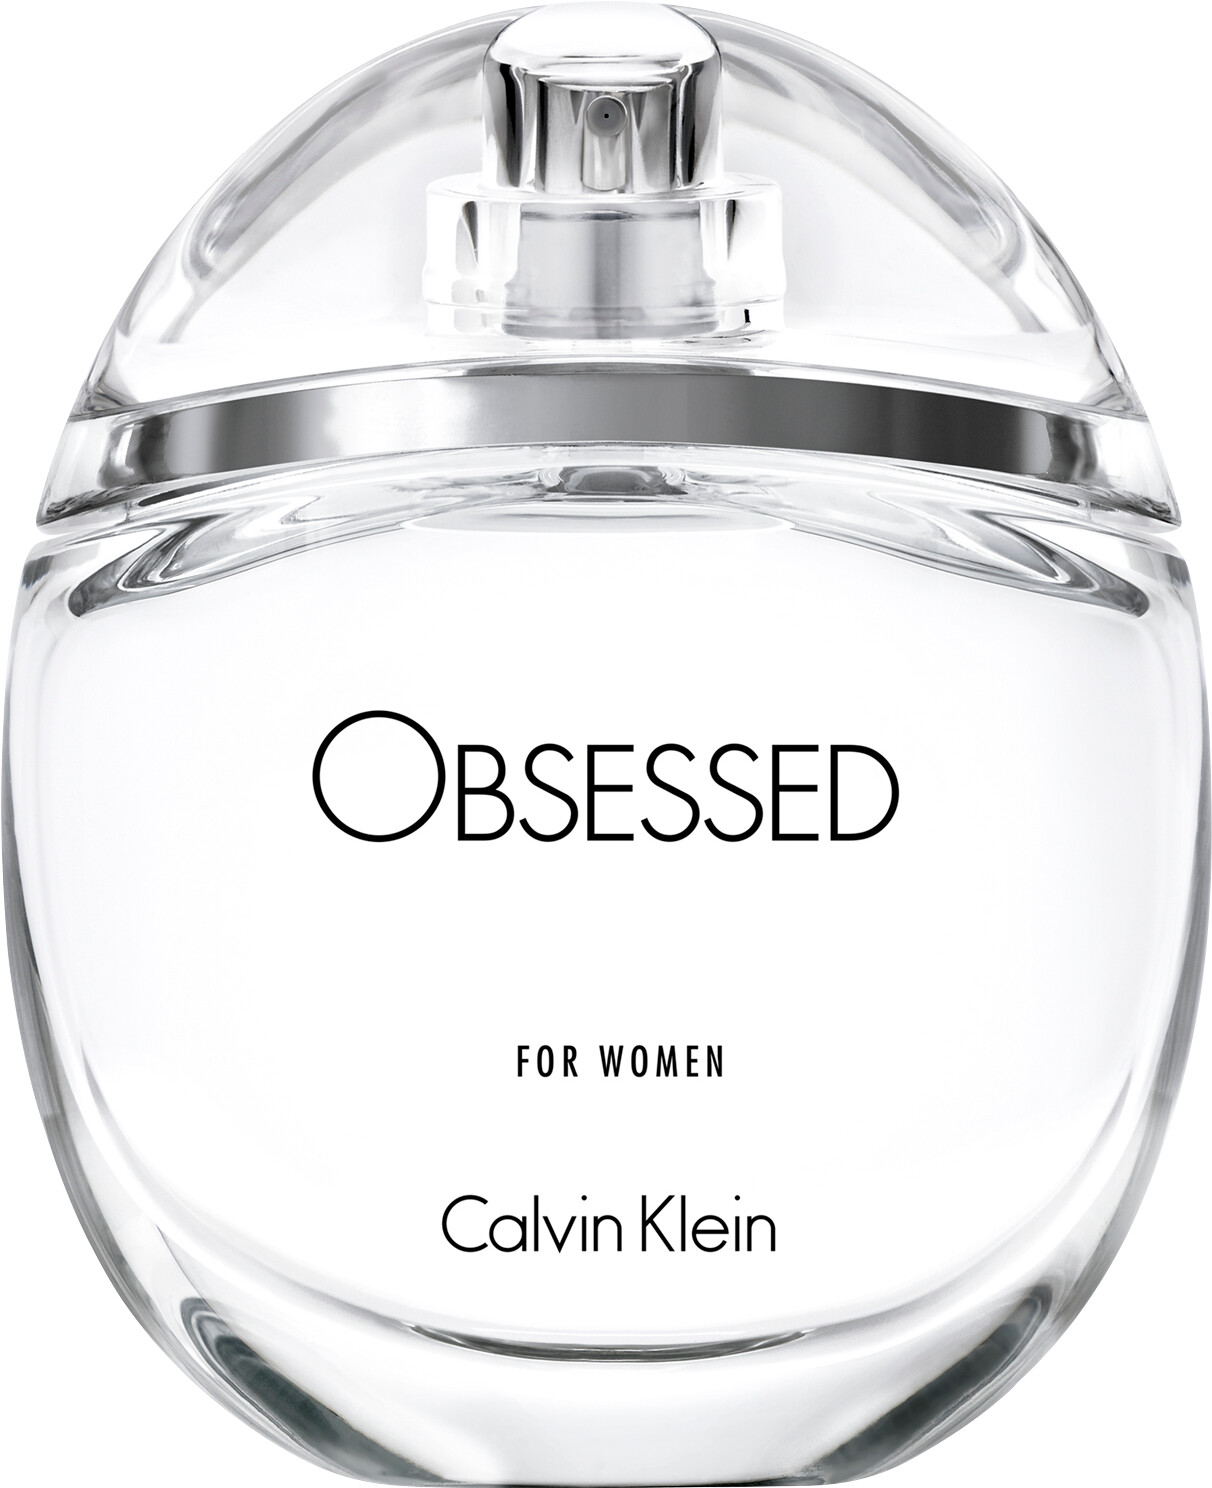 Calvin Klein Obsessed For Women Eau De Parfum Spray